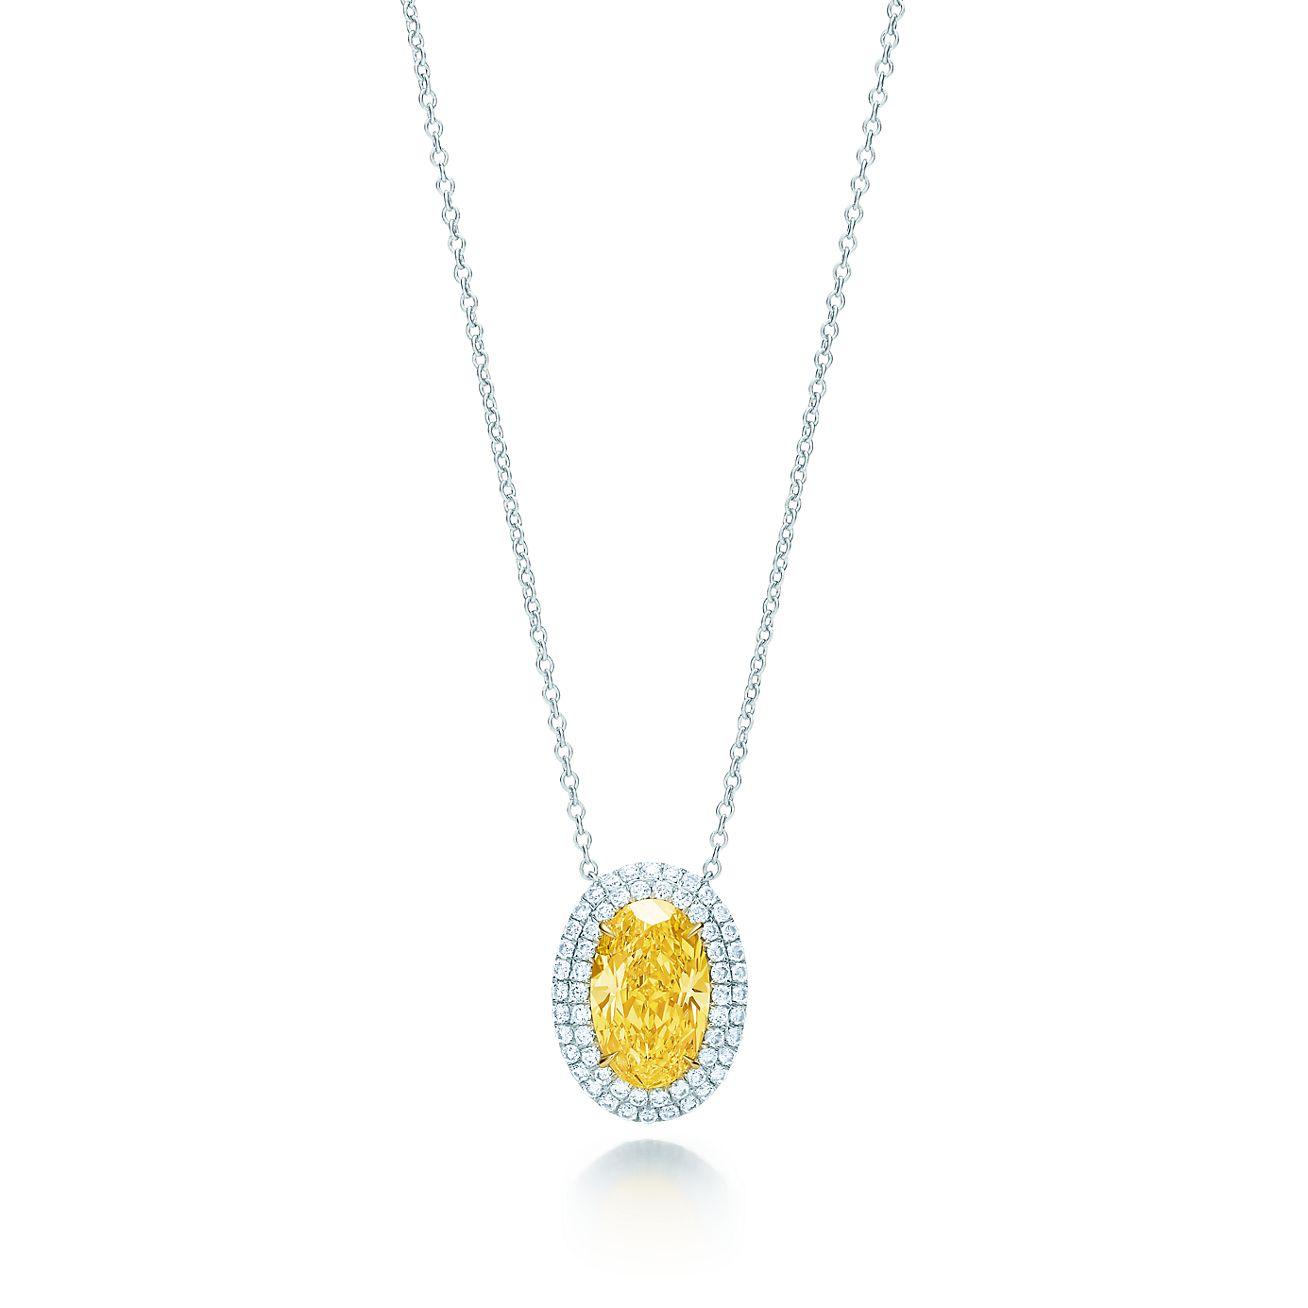 Tiffany Soleste Yellow Diamond Pendant In Platinum And 18k Gold With Diamonds Tiffany Co